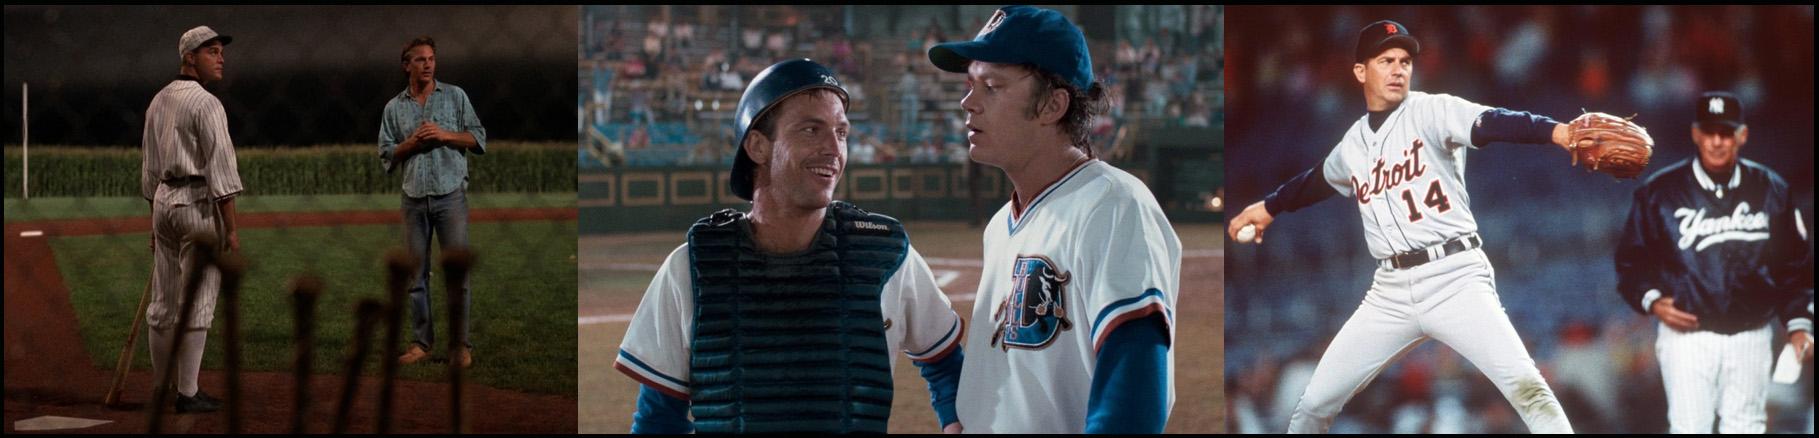 Kevin Costner Baseballfilme